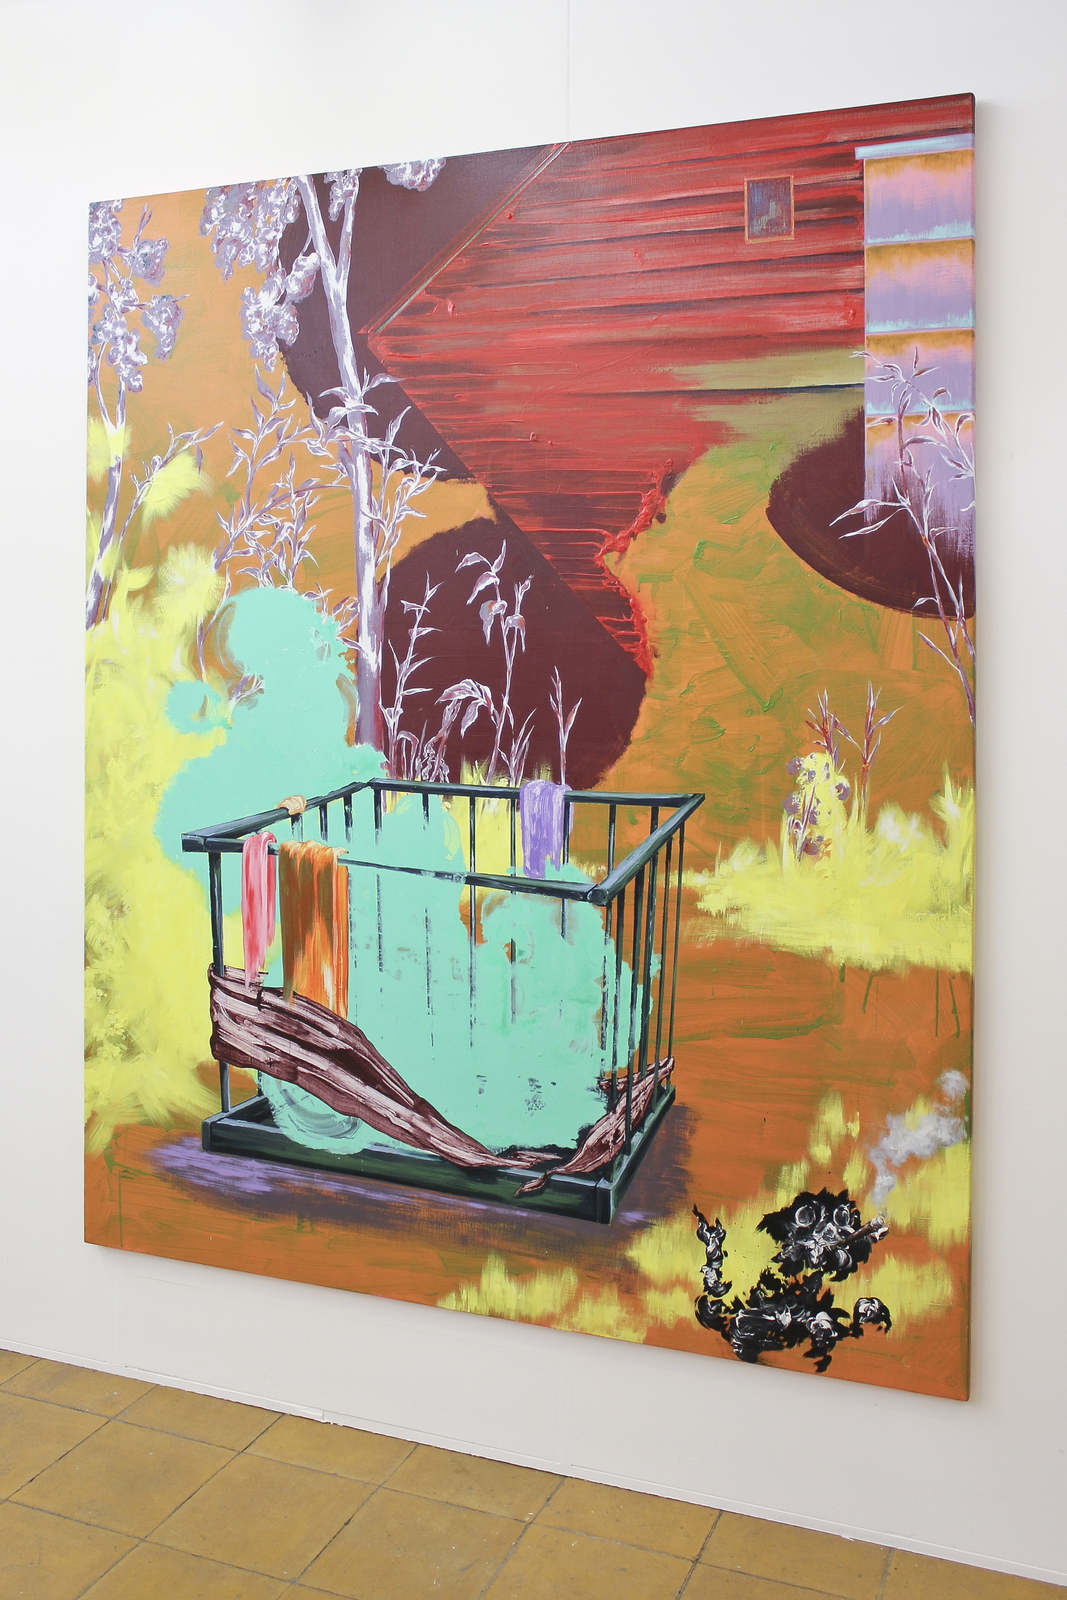 Gé-Karel van der Sterren at Flatland Gallery, Amsterdam 01